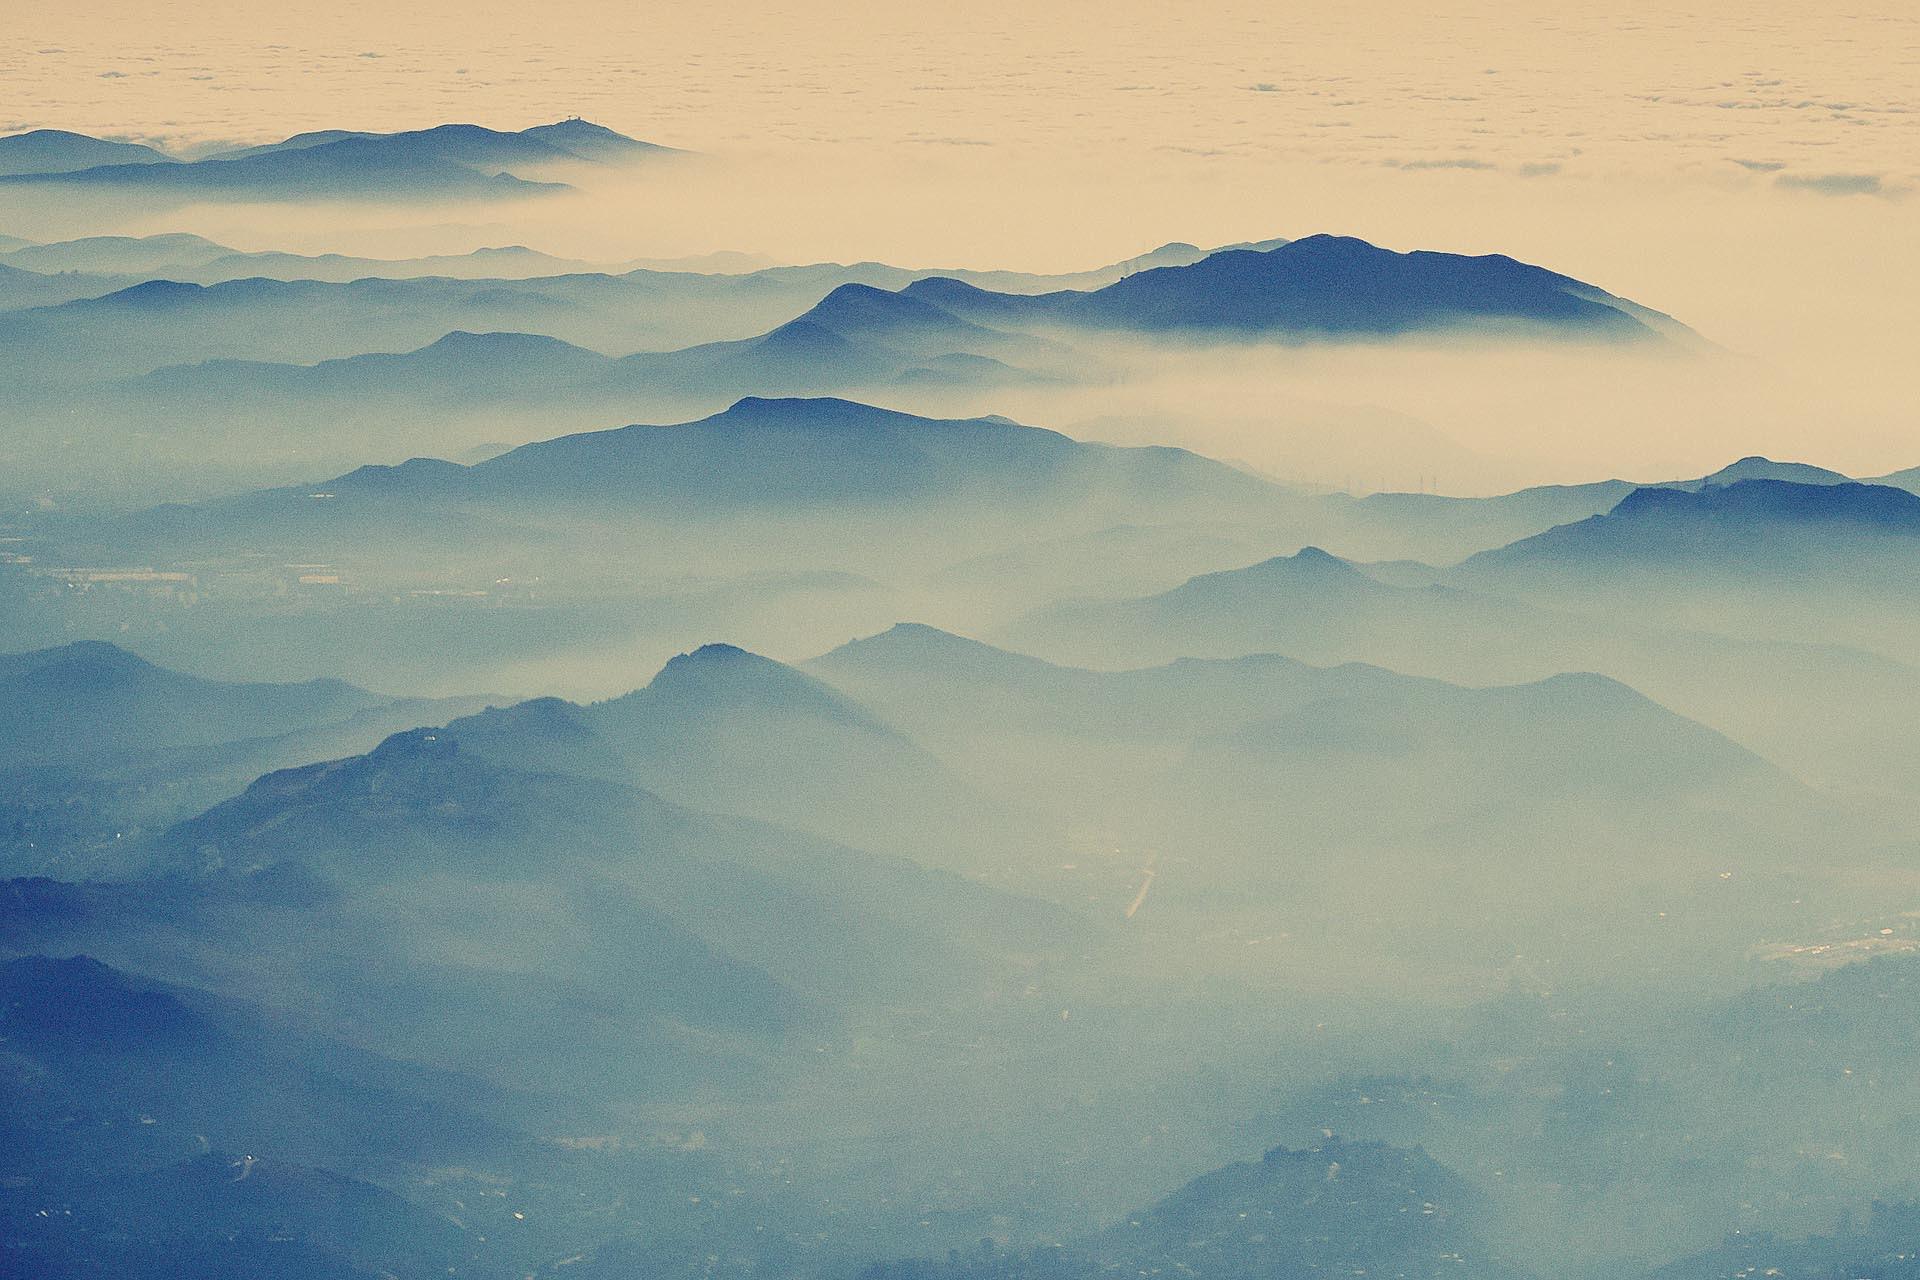 Aerial_PhillipAngert - 7.jpg